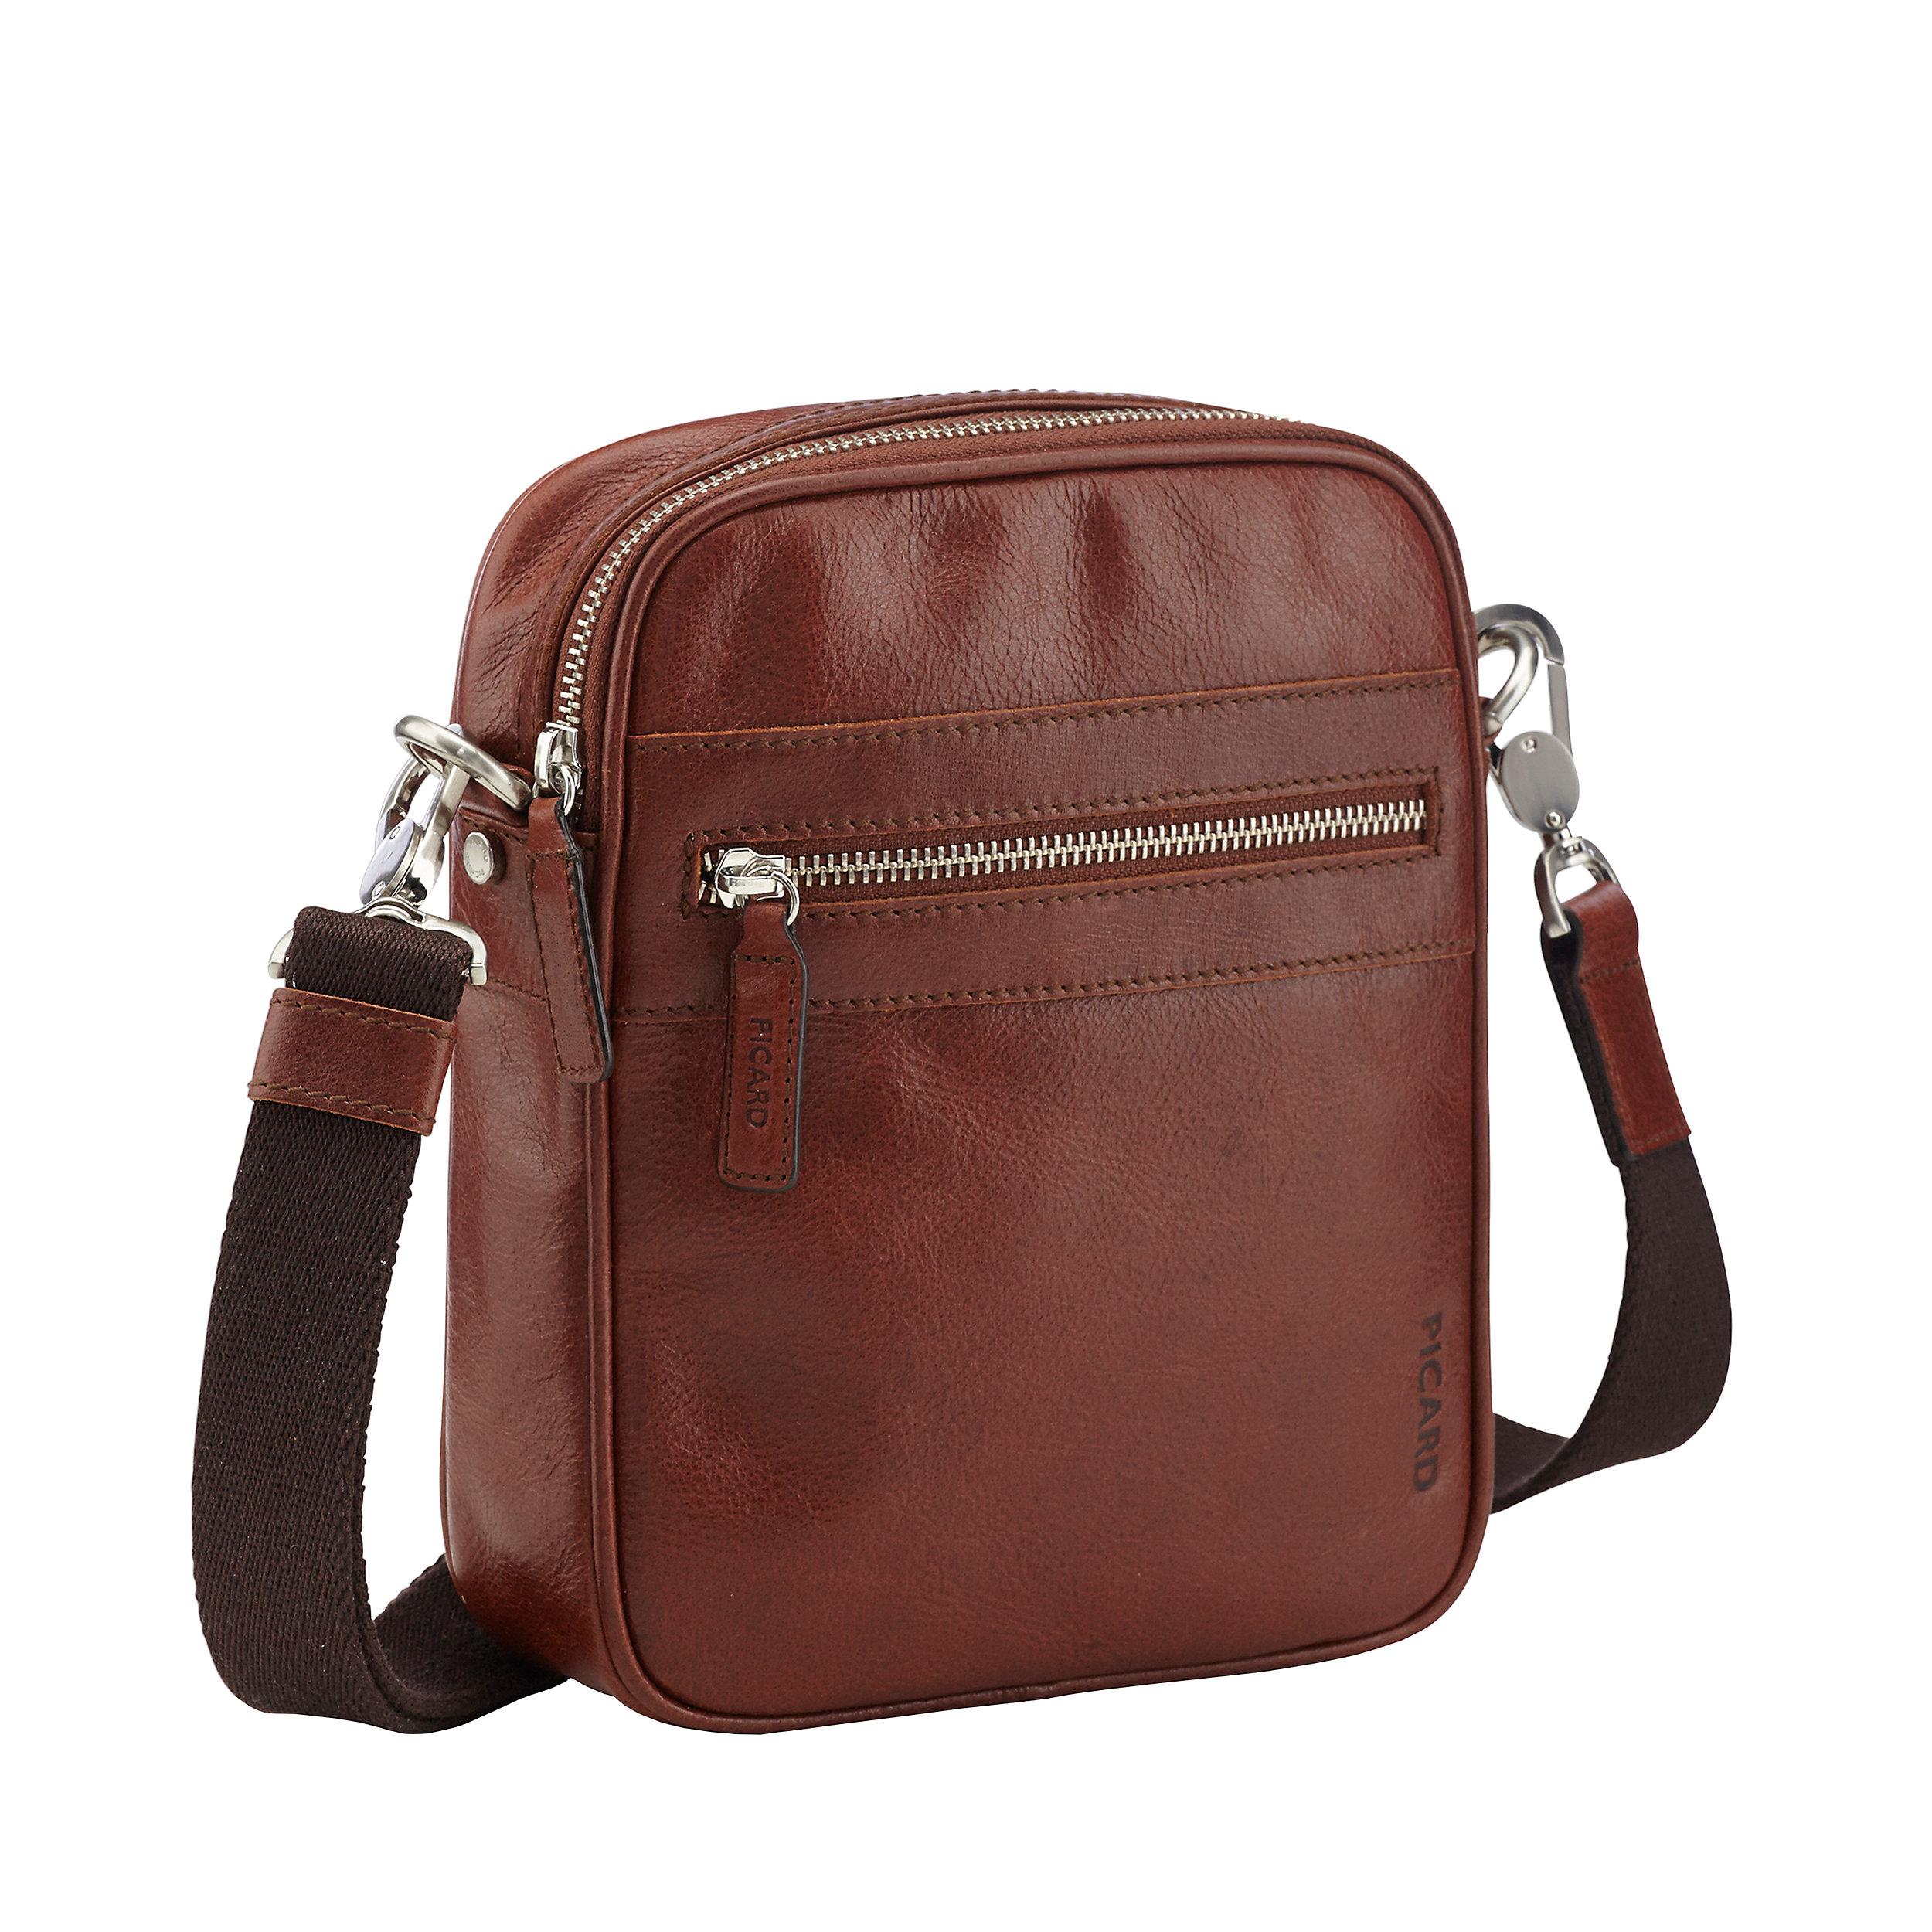 Crossbody Bag 1 zipped front pocket Buddy